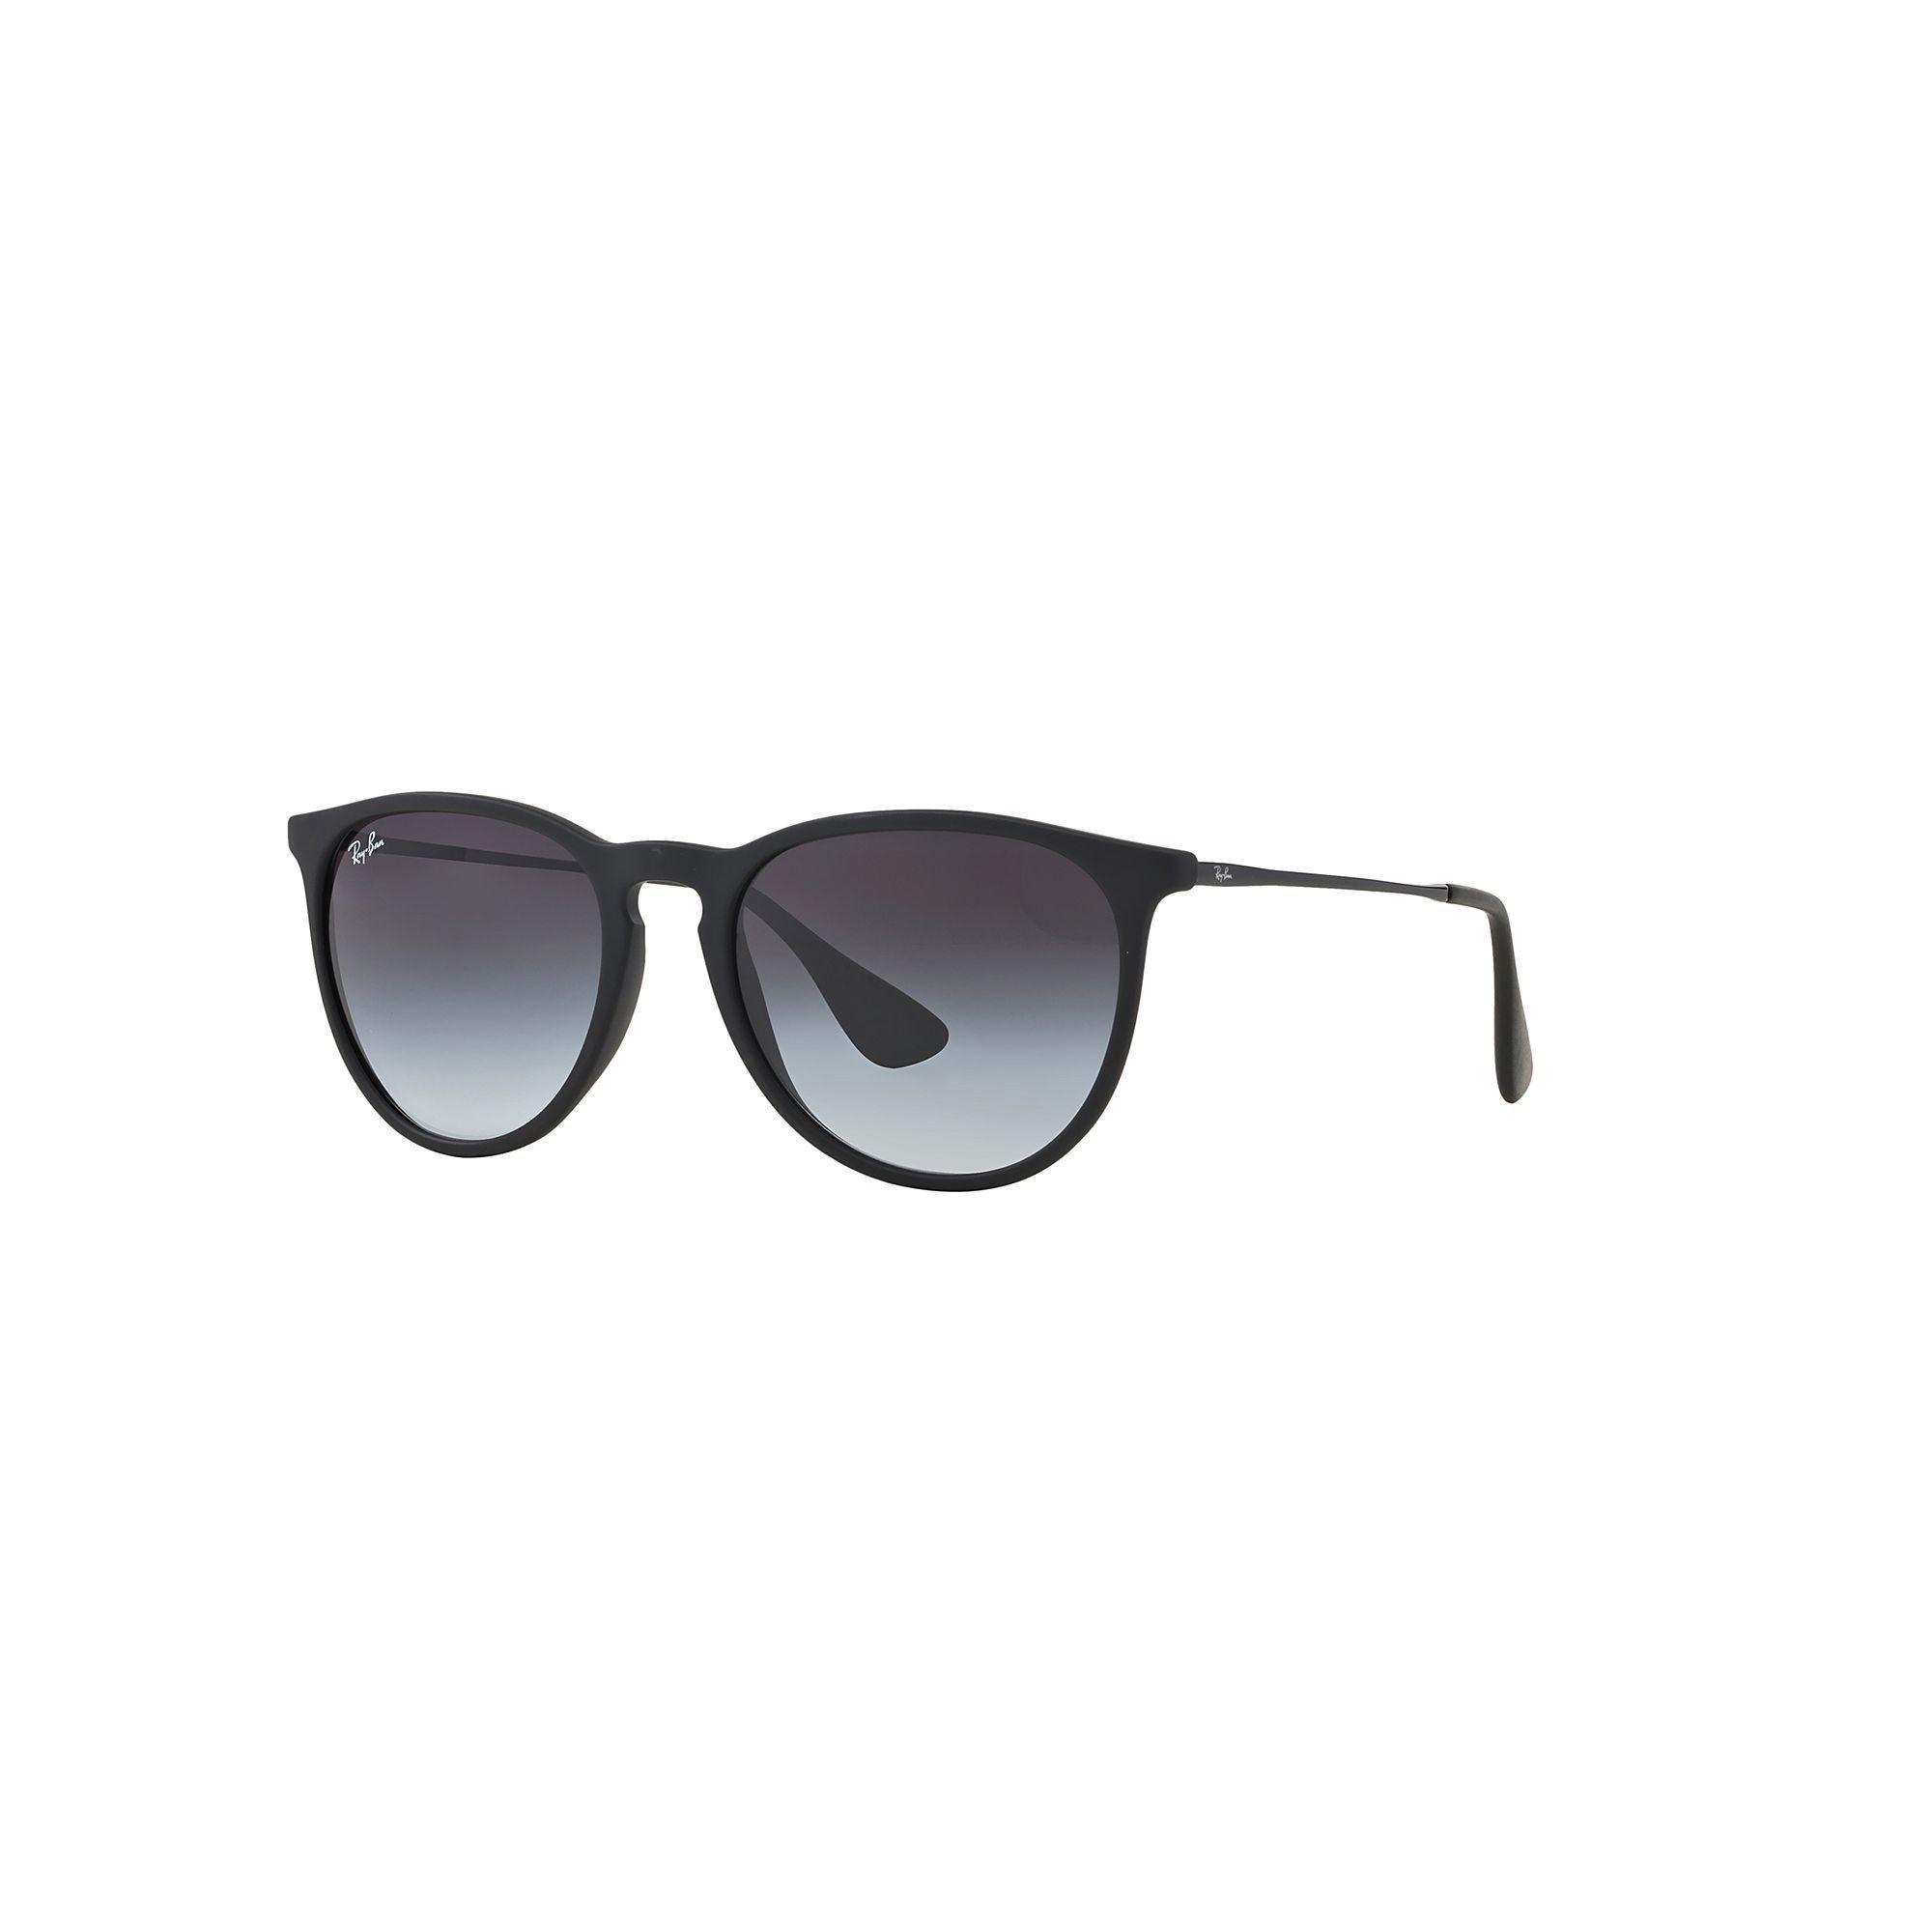 0a5bd591aa Ray-Ban Erika RB4171 54mm Pilot Gradient Sunglasses